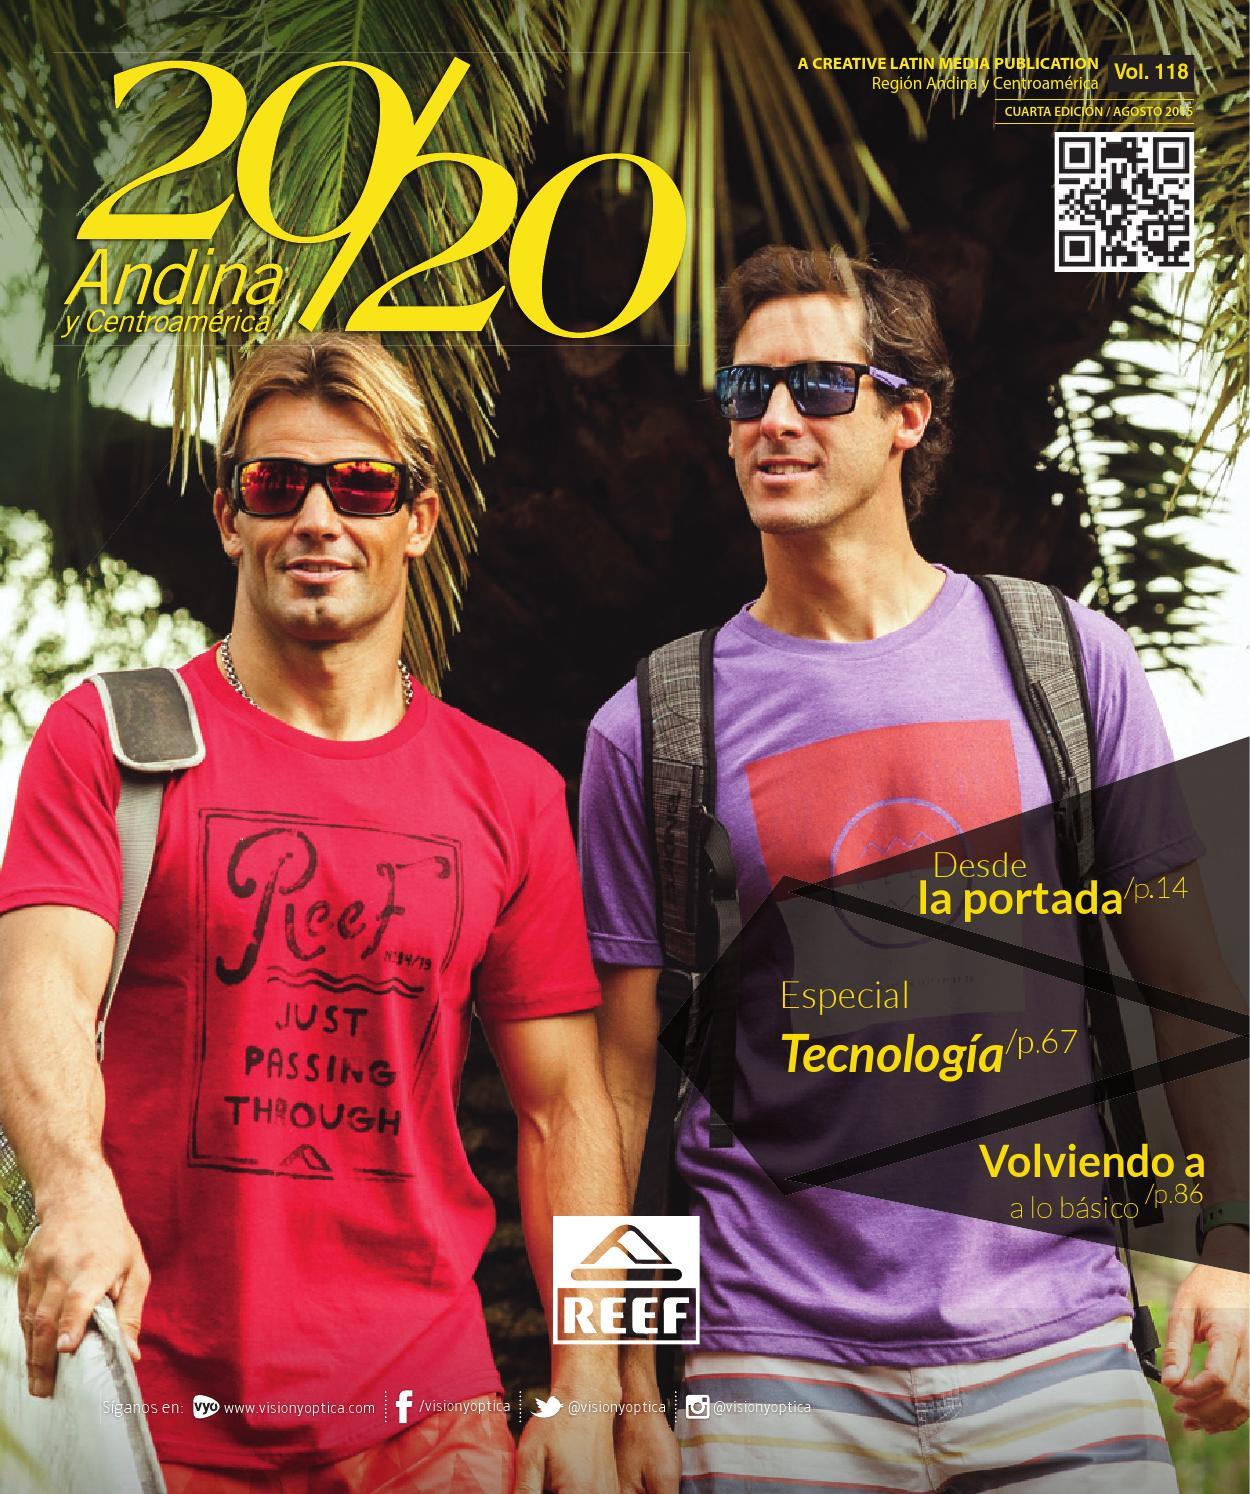 2e88d2ed4 2020 Andina 4ta 2015 by Creative Latin Media LLC - issuu